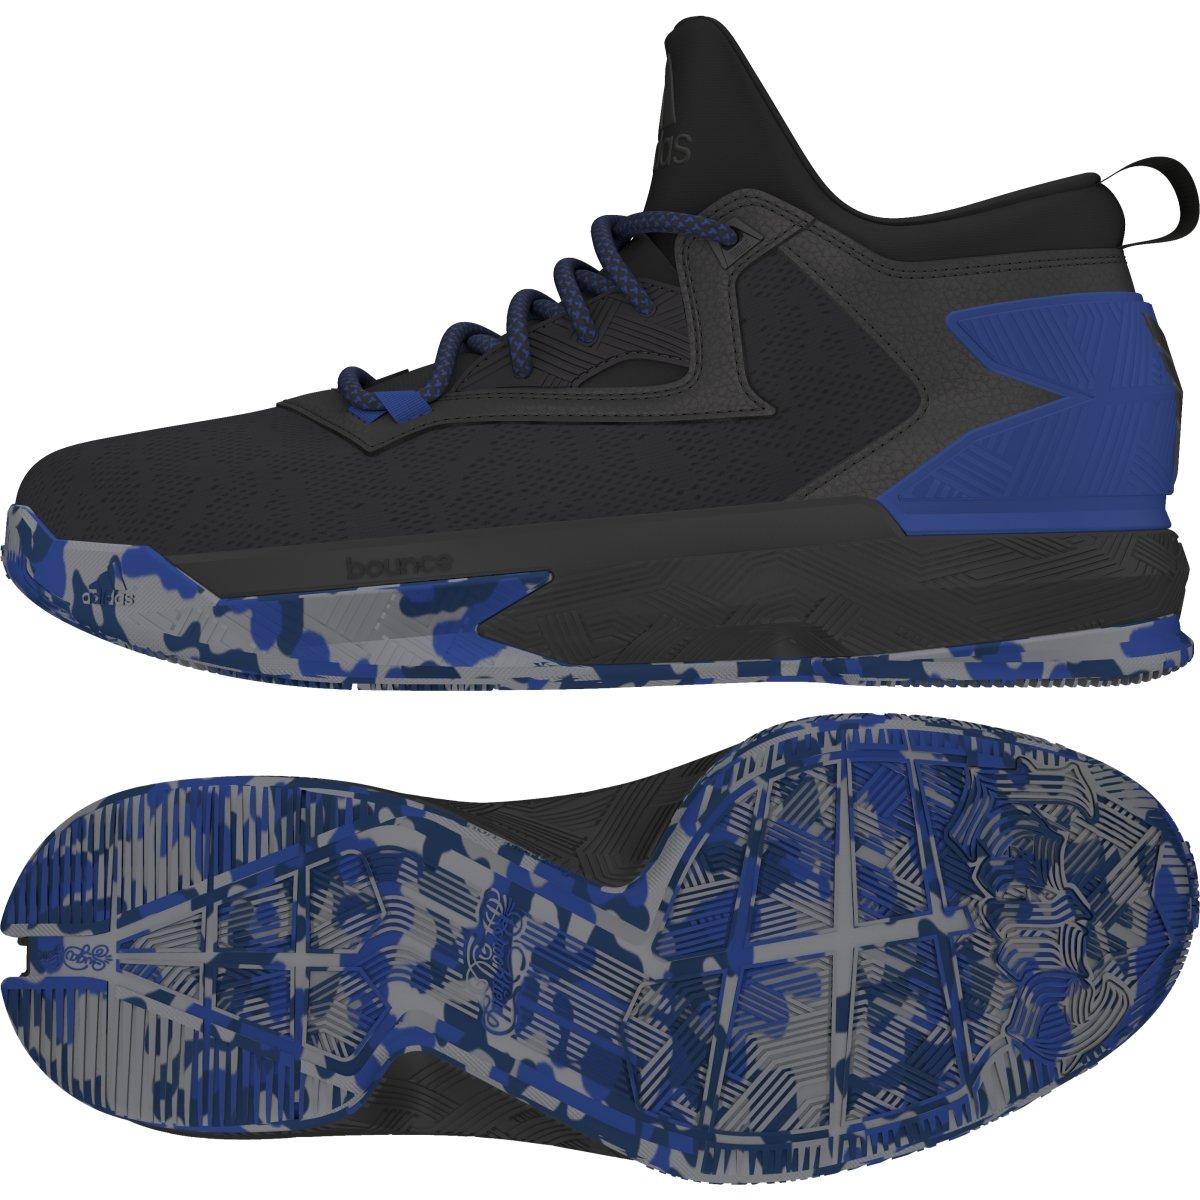 detailed look 74687 cd065 Galleon - Adidas D Lillard 2 Basketball Shoe - CblackScarleBlack - Mens -  9.5